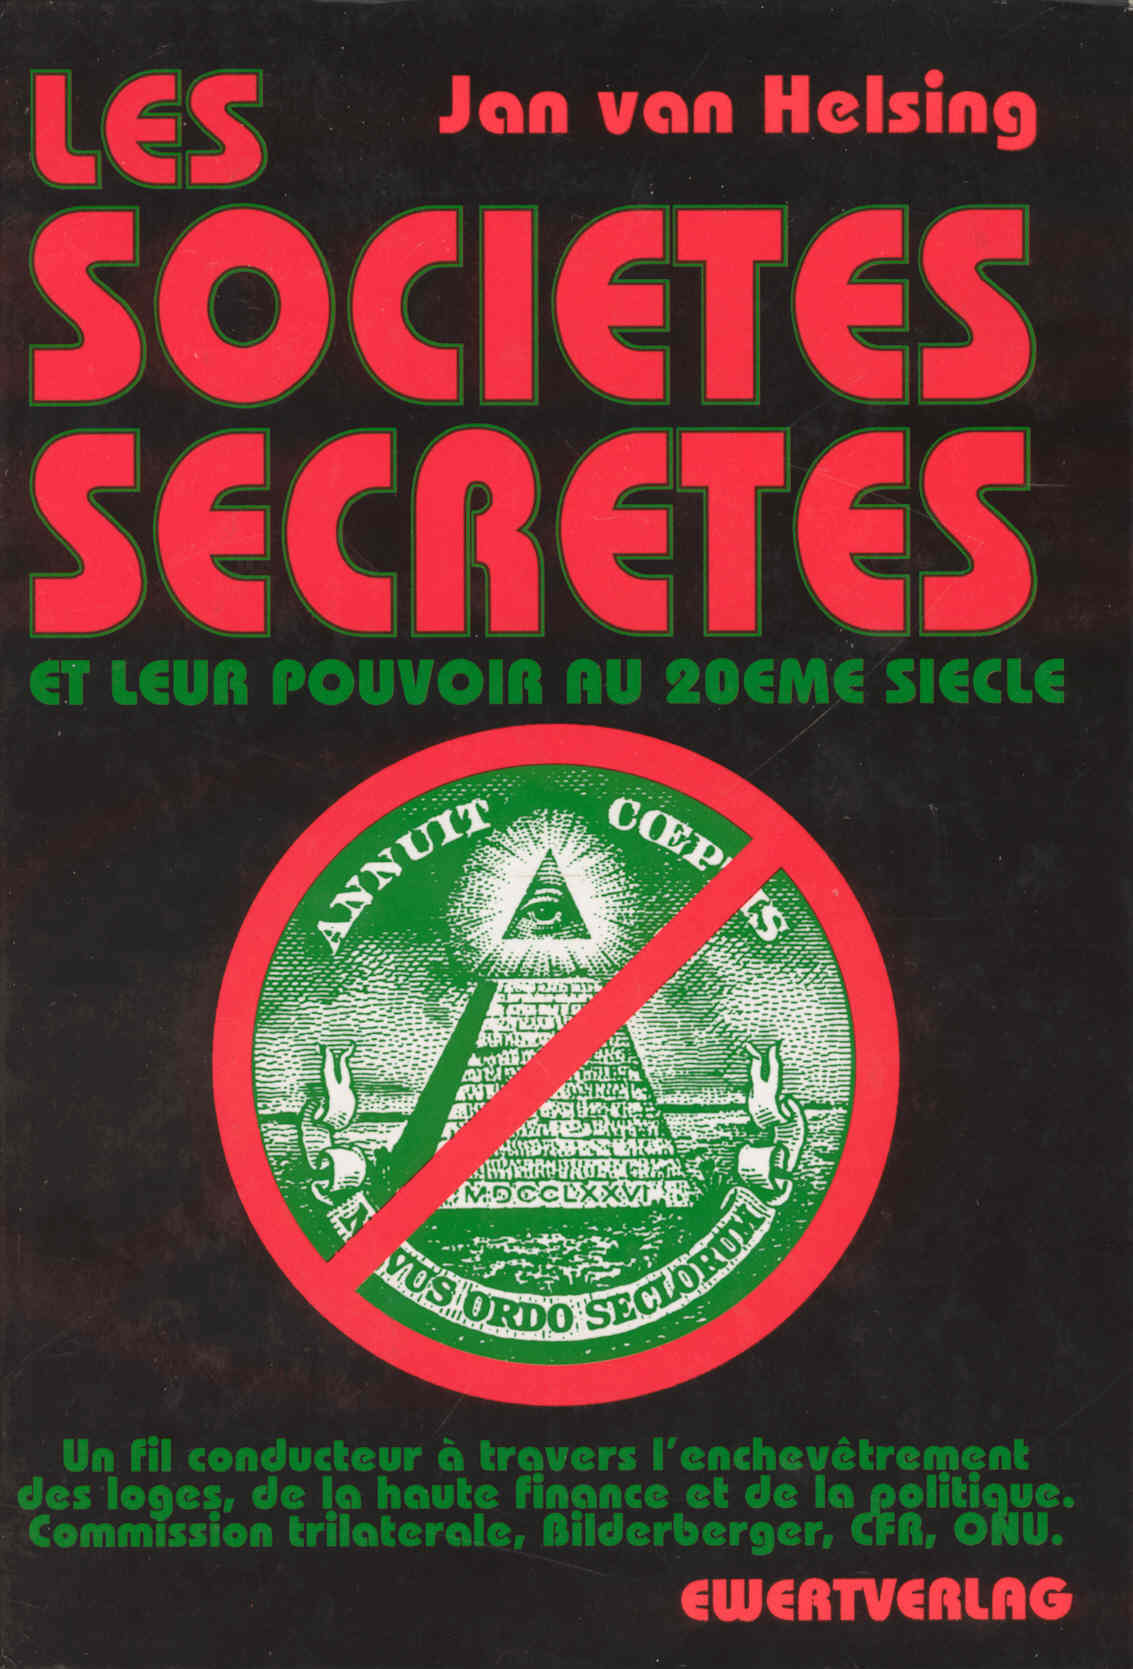 Van helsing geheimgesellschaften